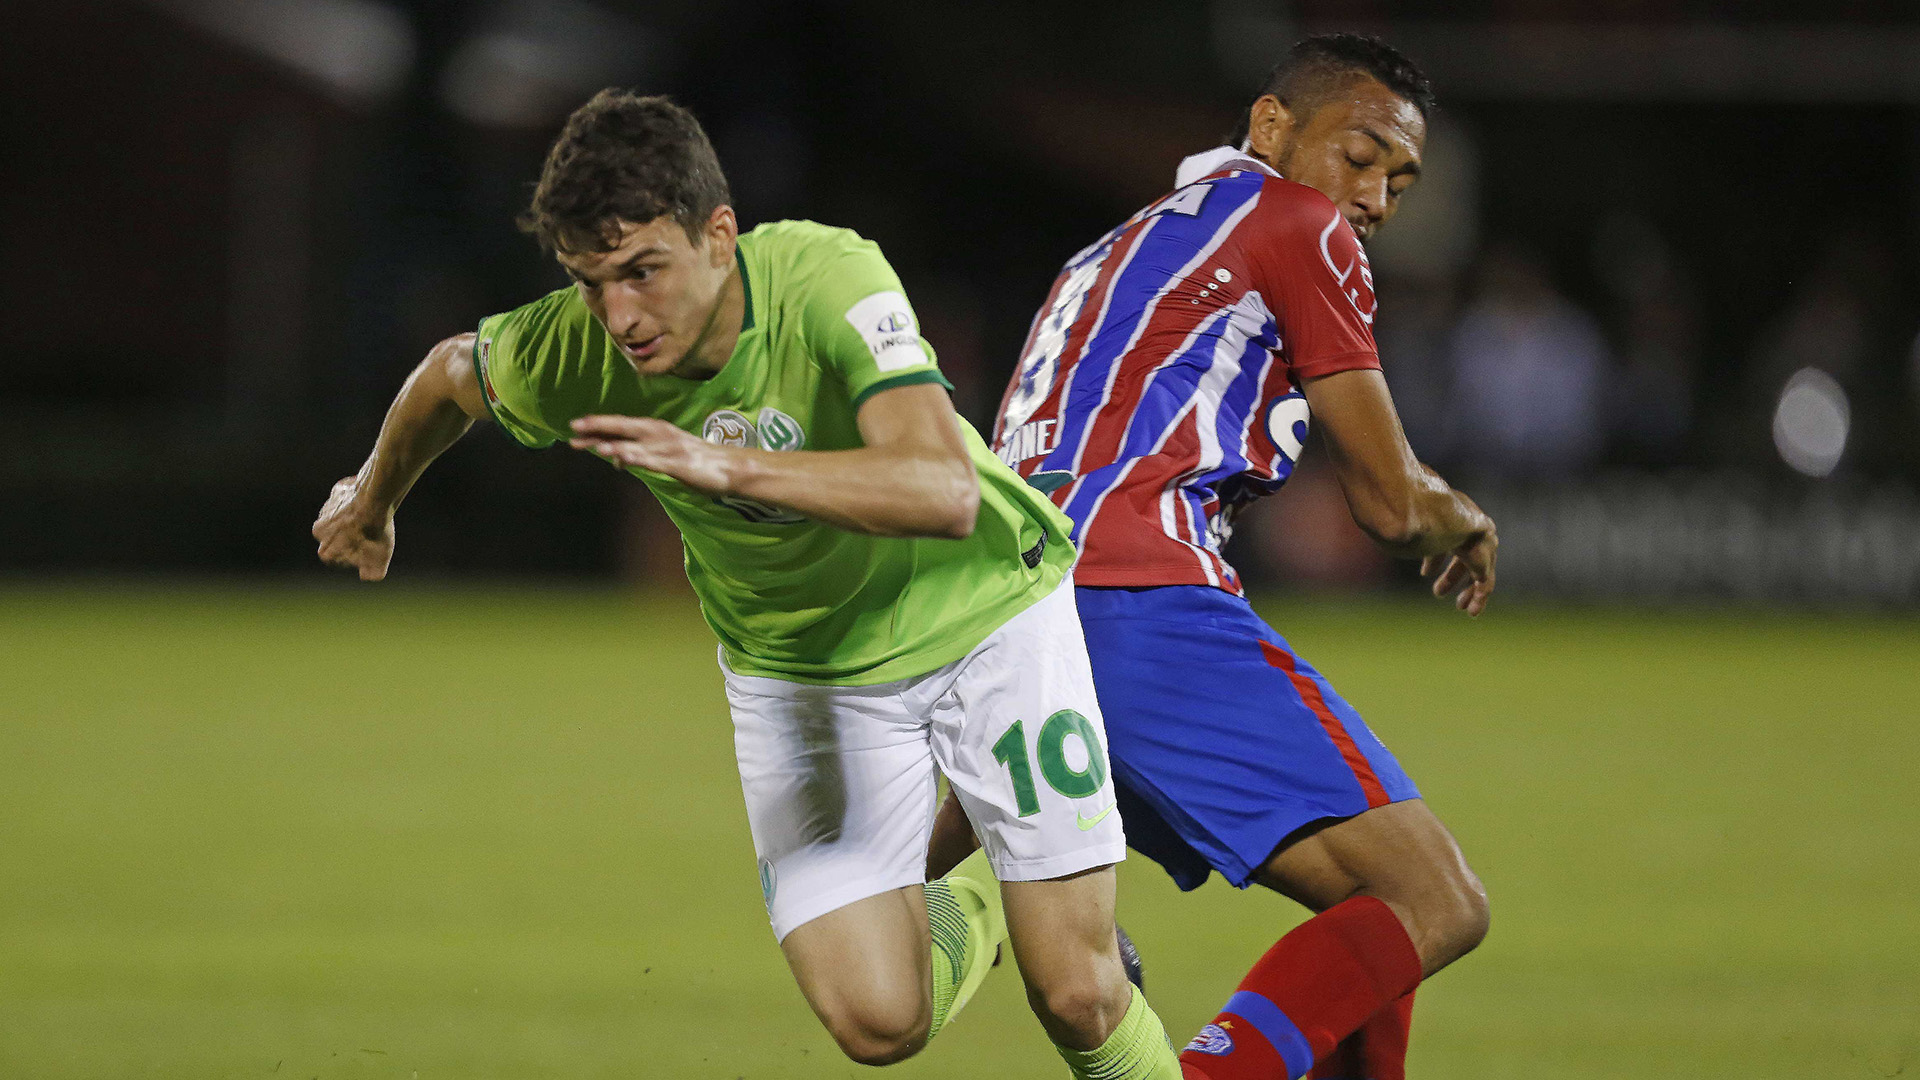 Photo of Florida Cup: Wolfsburg vs. Bahia Match a 0-0 Draw. Wolfsburg Wins on Penalty Kicks